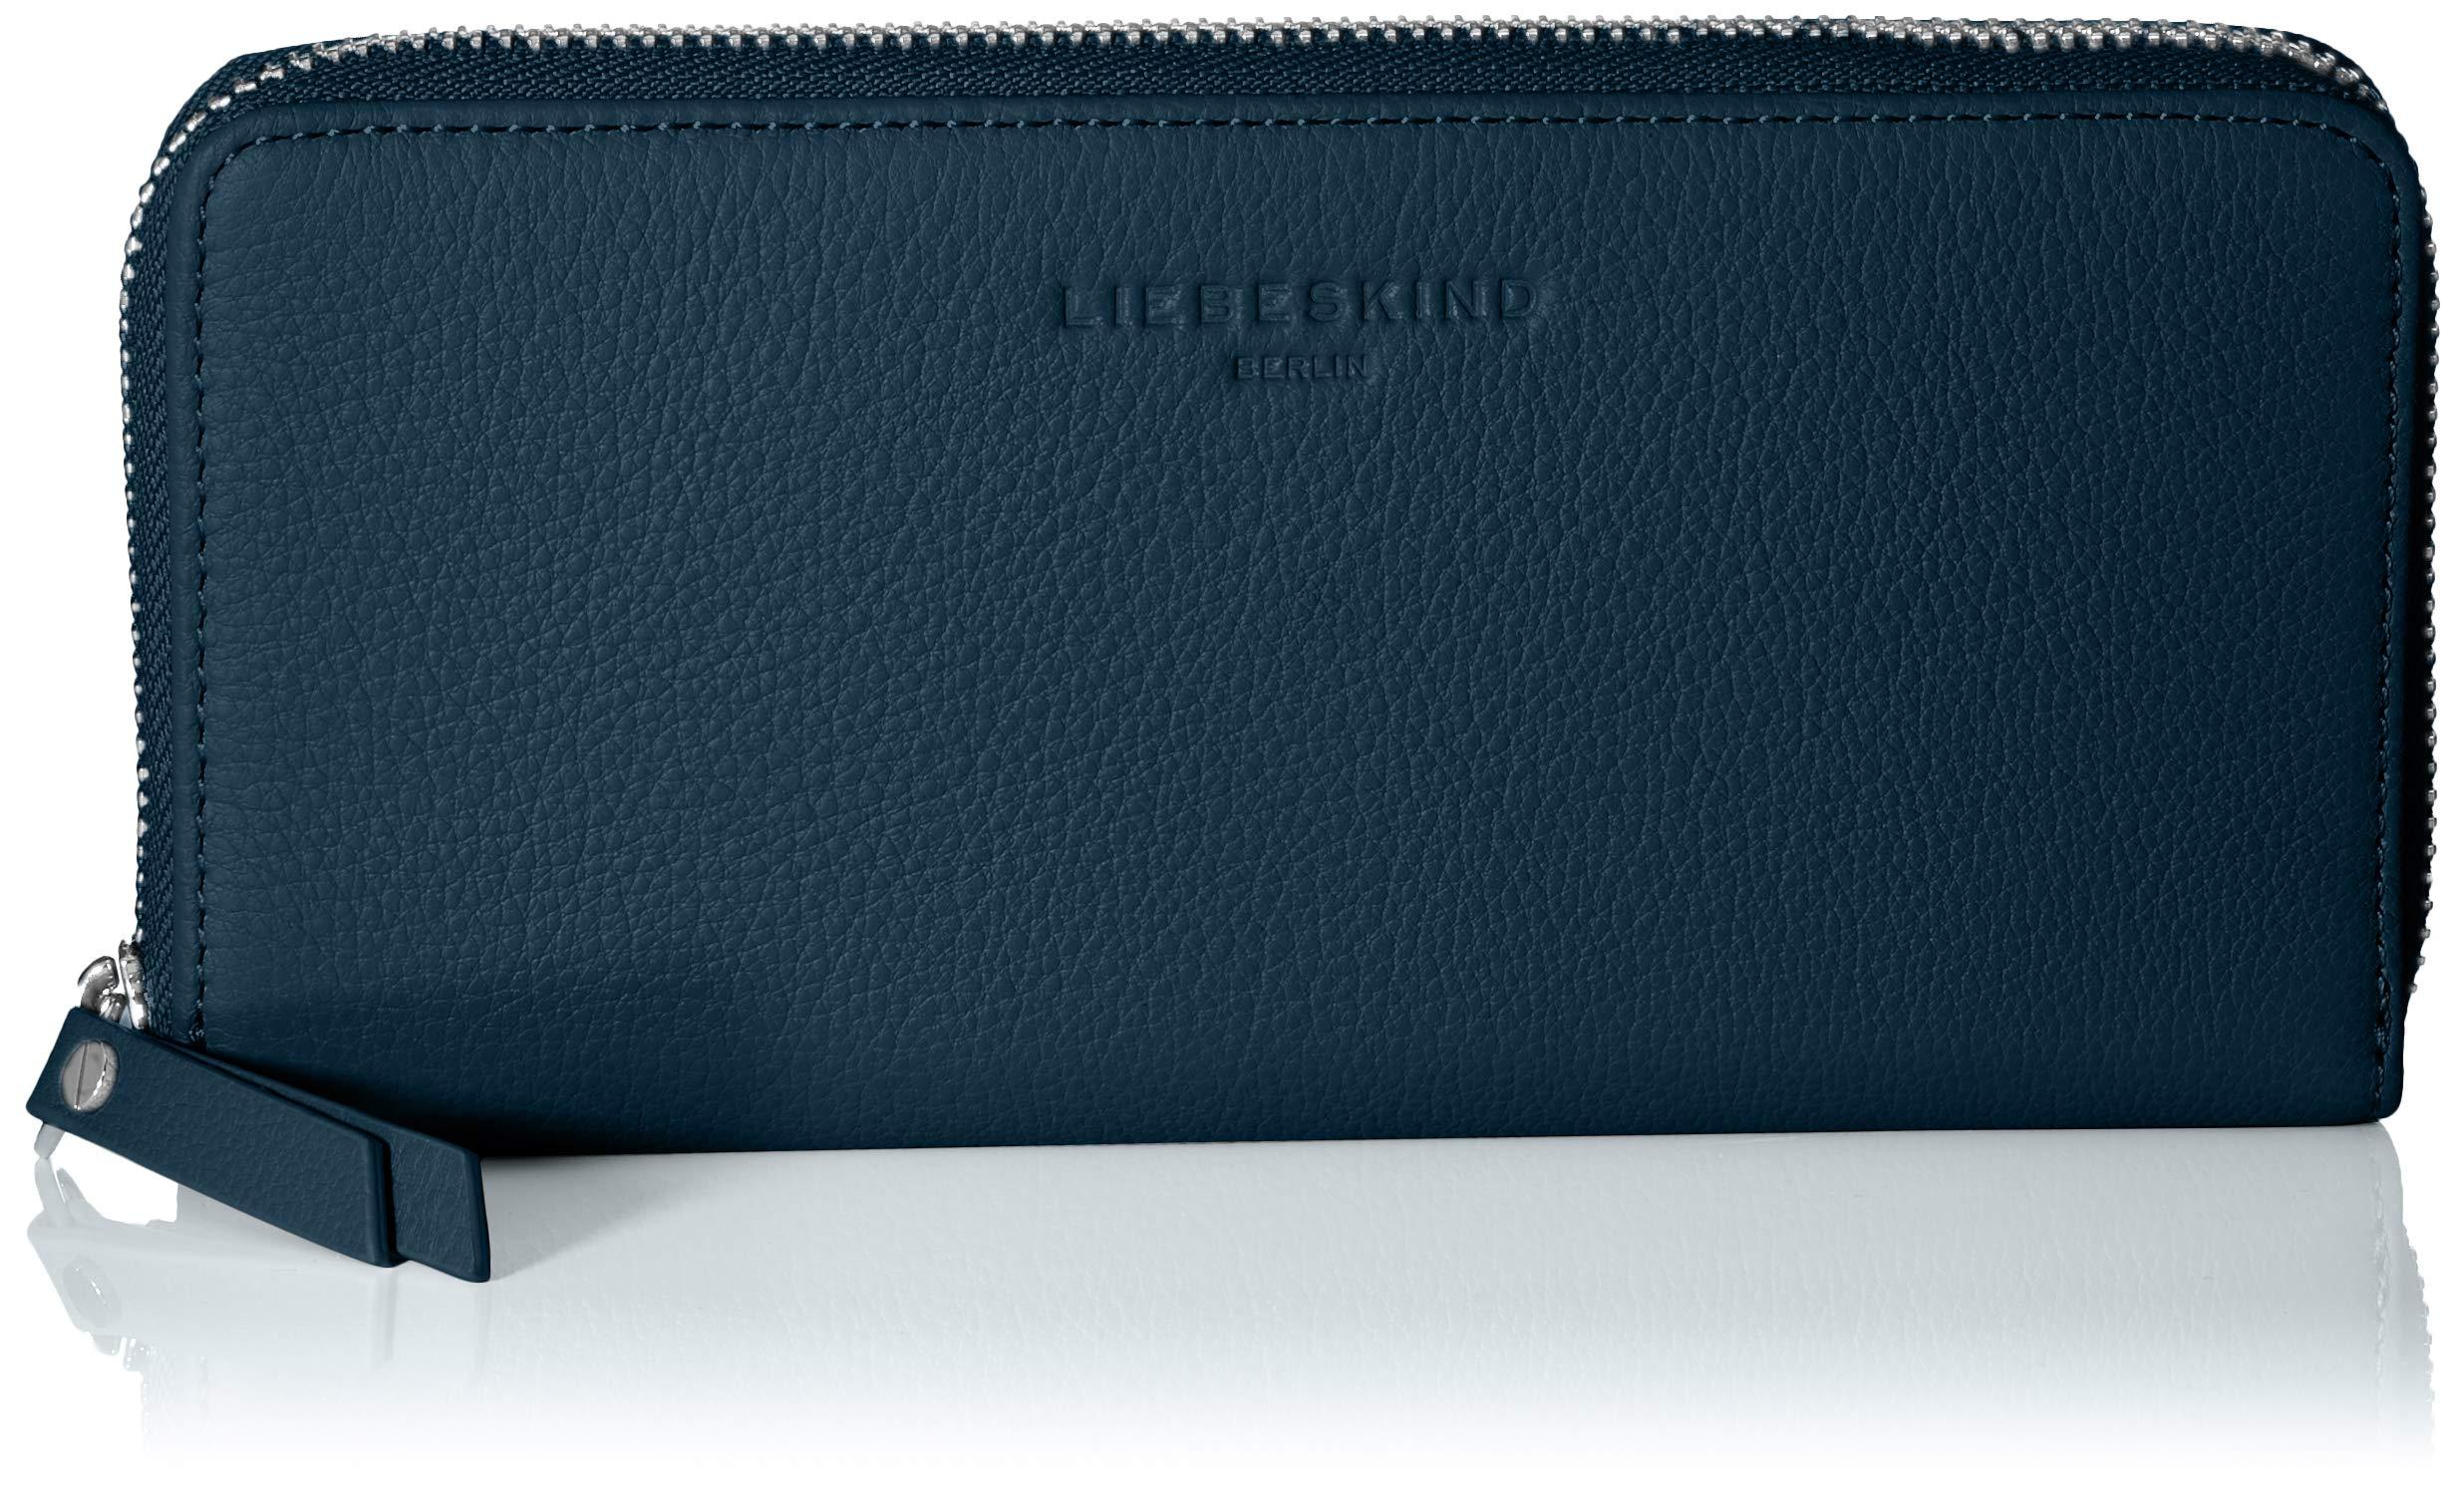 Centimetersb X Blue2x10x19 Wallet H SlgGigi Largefemmeportefeuillesbleuchina Liebeskind Berlin Basic T 3L4R5Aqcj